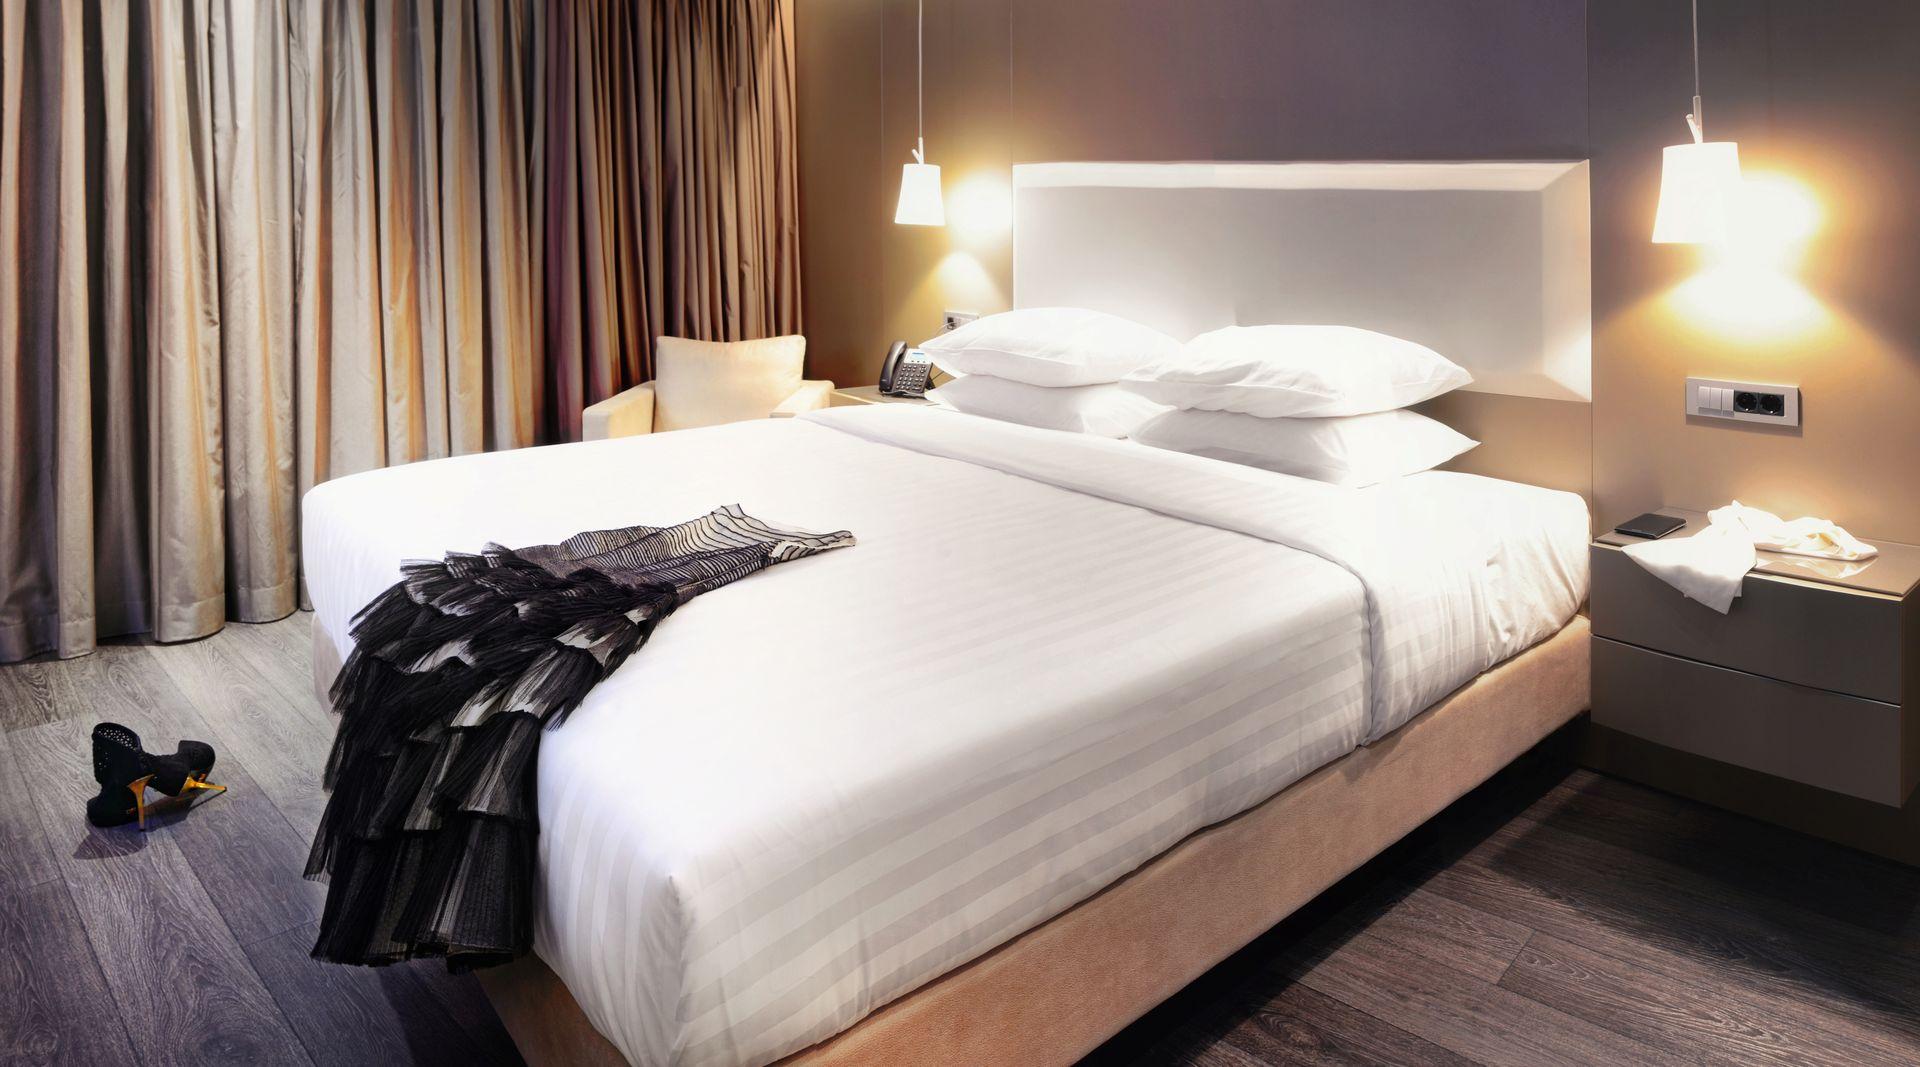 4* SAZ City Life Hotel Ioannina - Ιωάννινα ✦ 4 Ημέρες